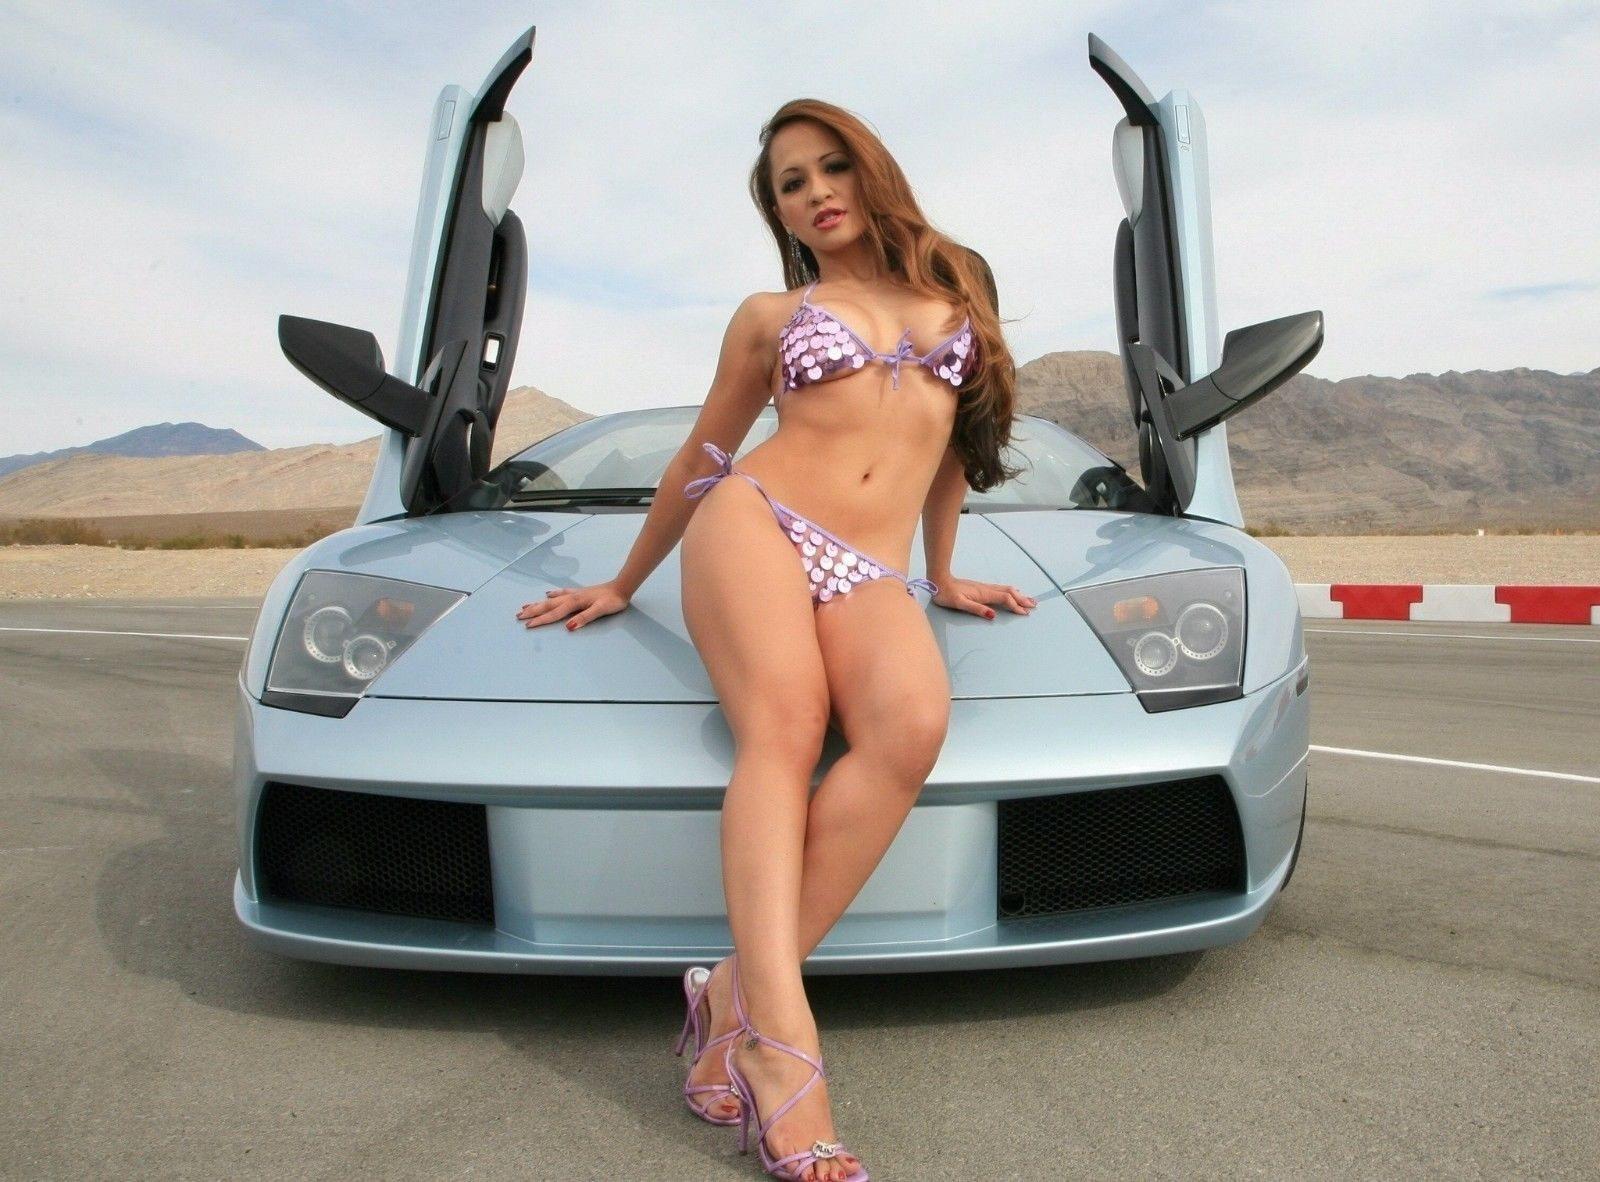 127295 Beautiful Girl on Super Sport Car Decor WALL PRINT POSTER AU